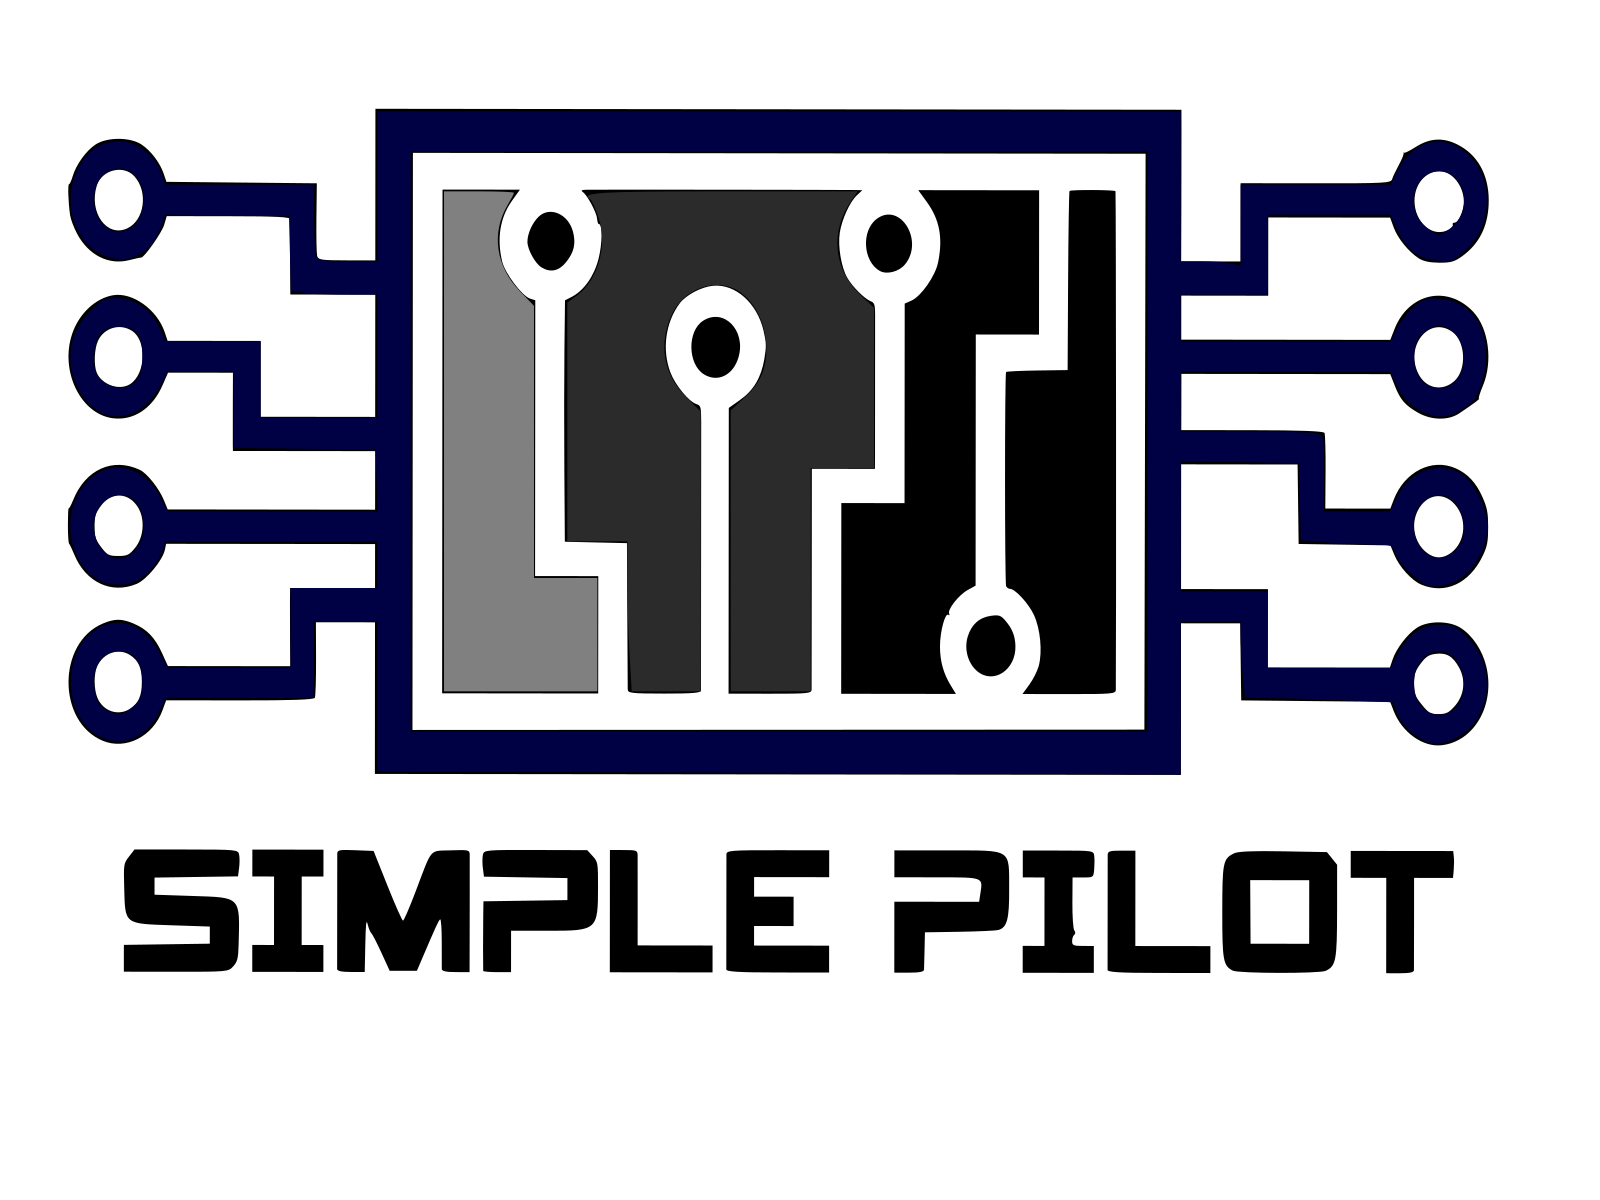 SimplePilotlogoPNG.png